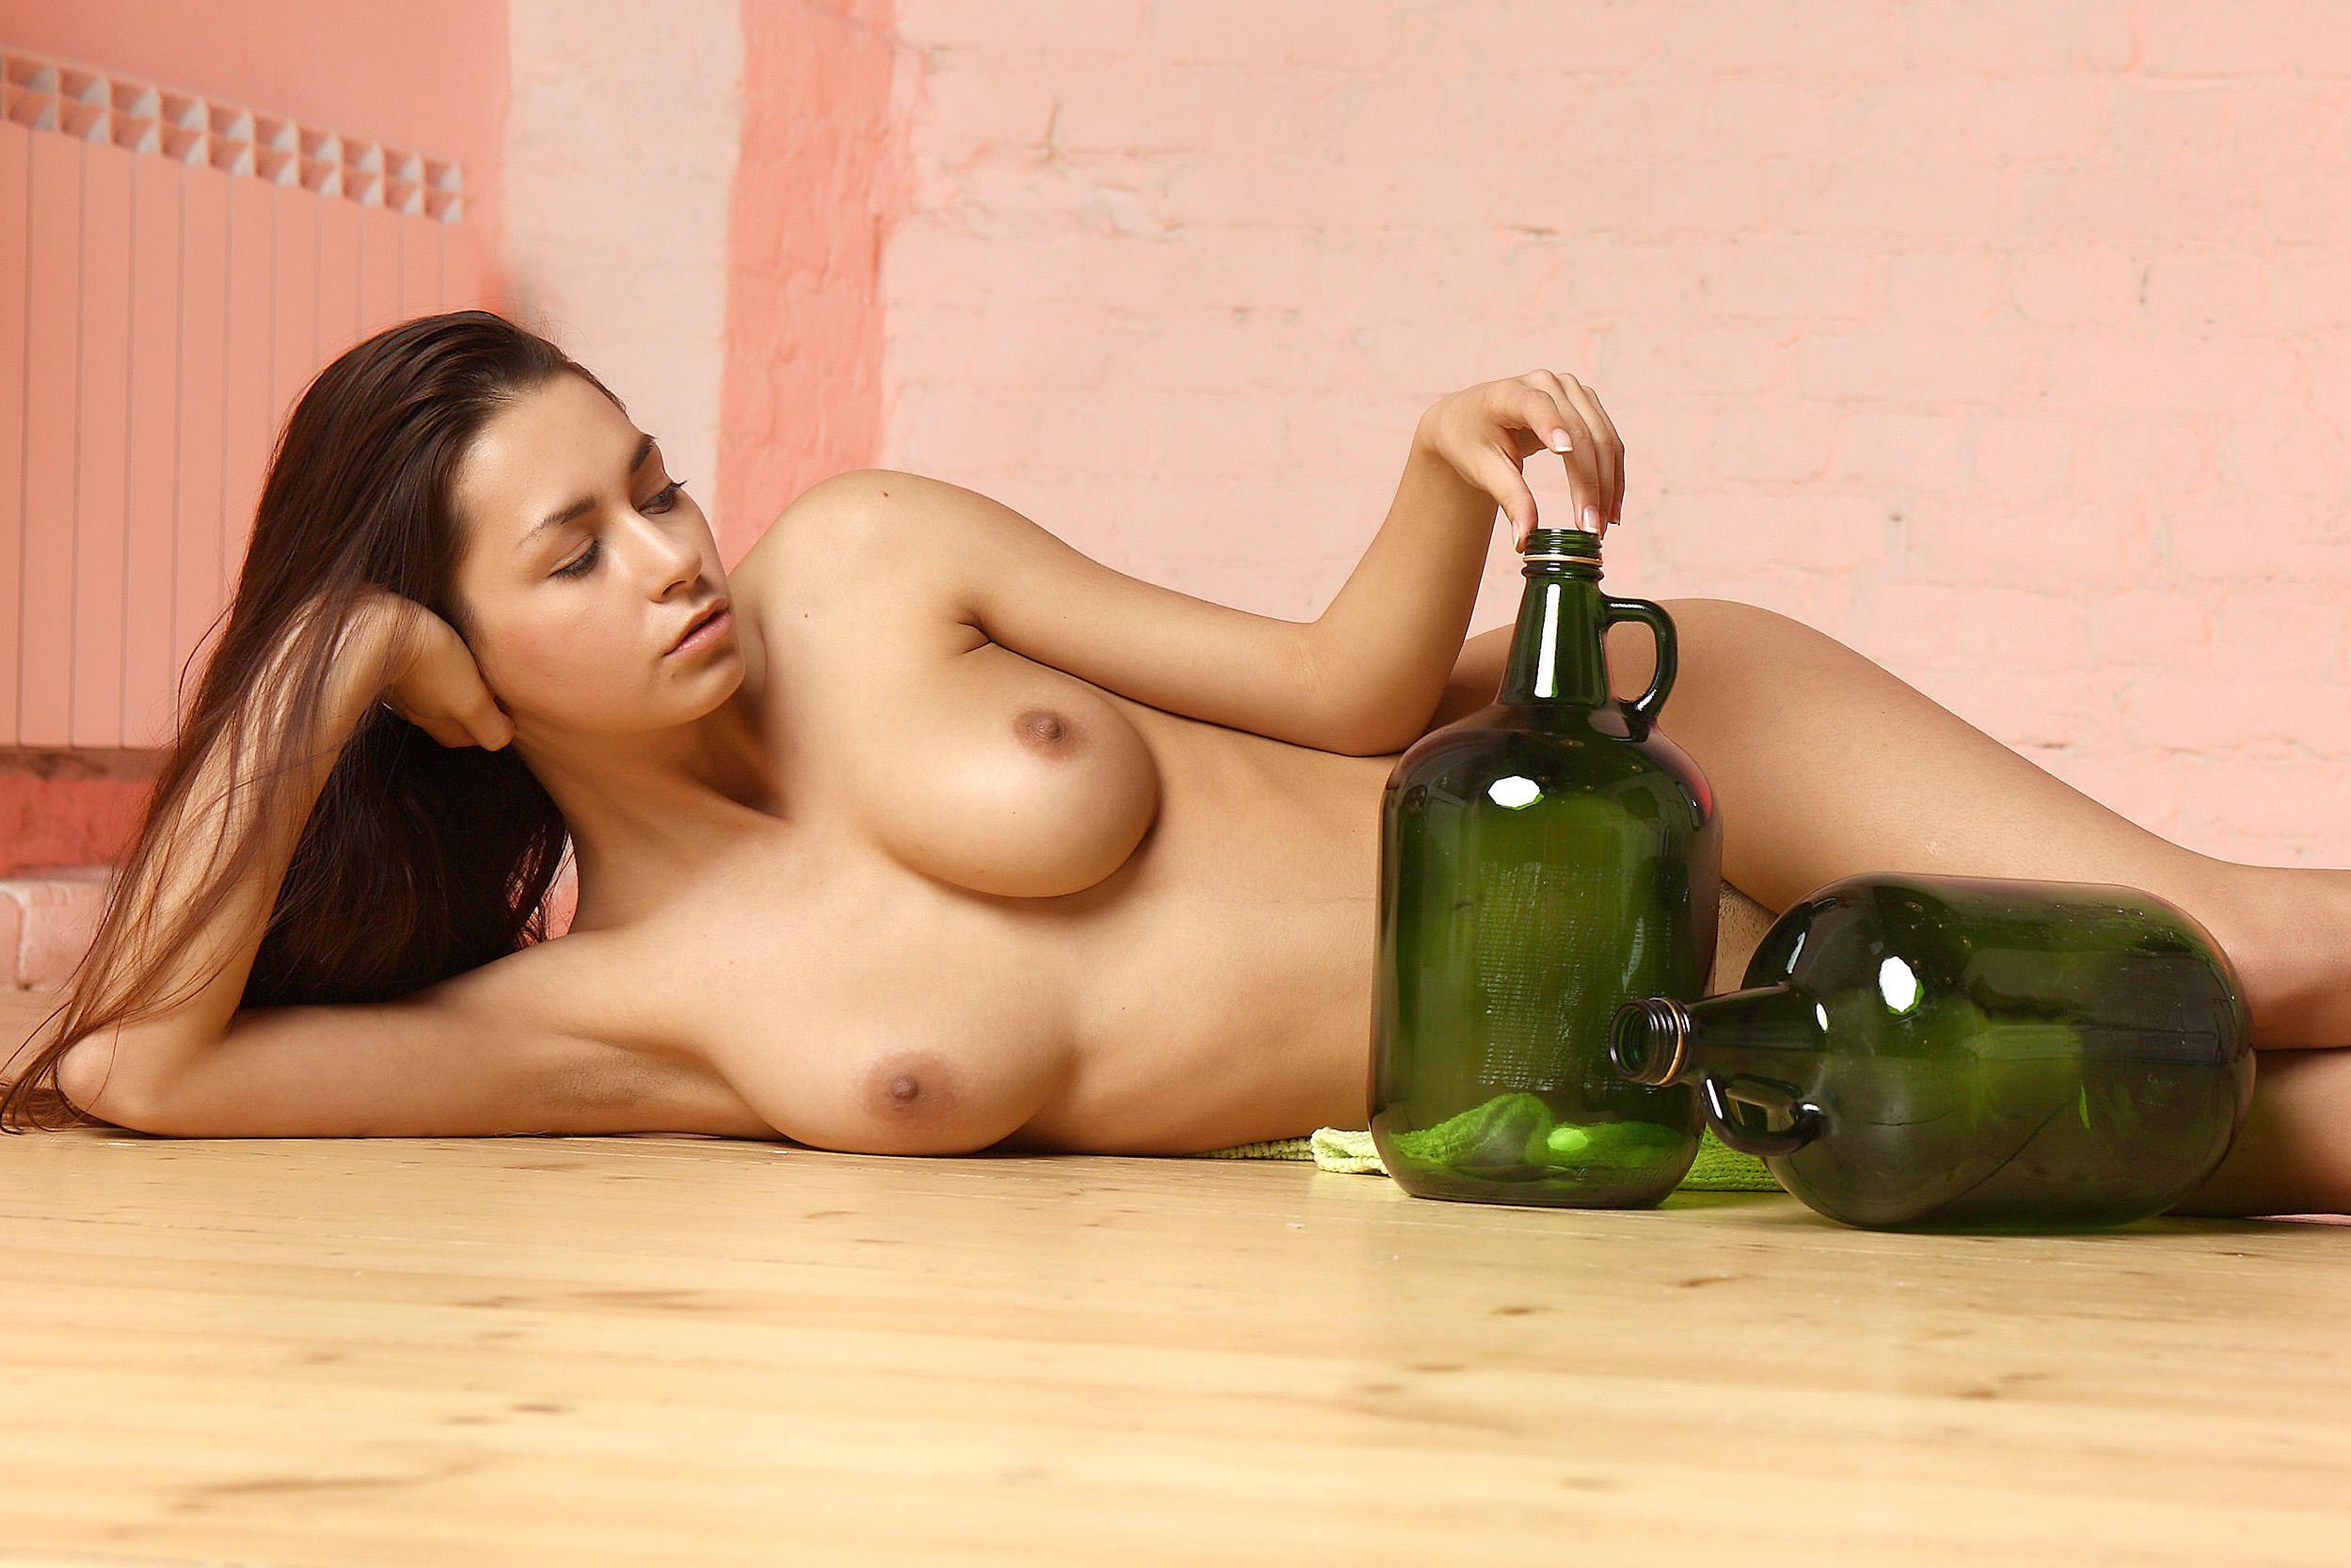 Juliana canty nude photos - 2019 year